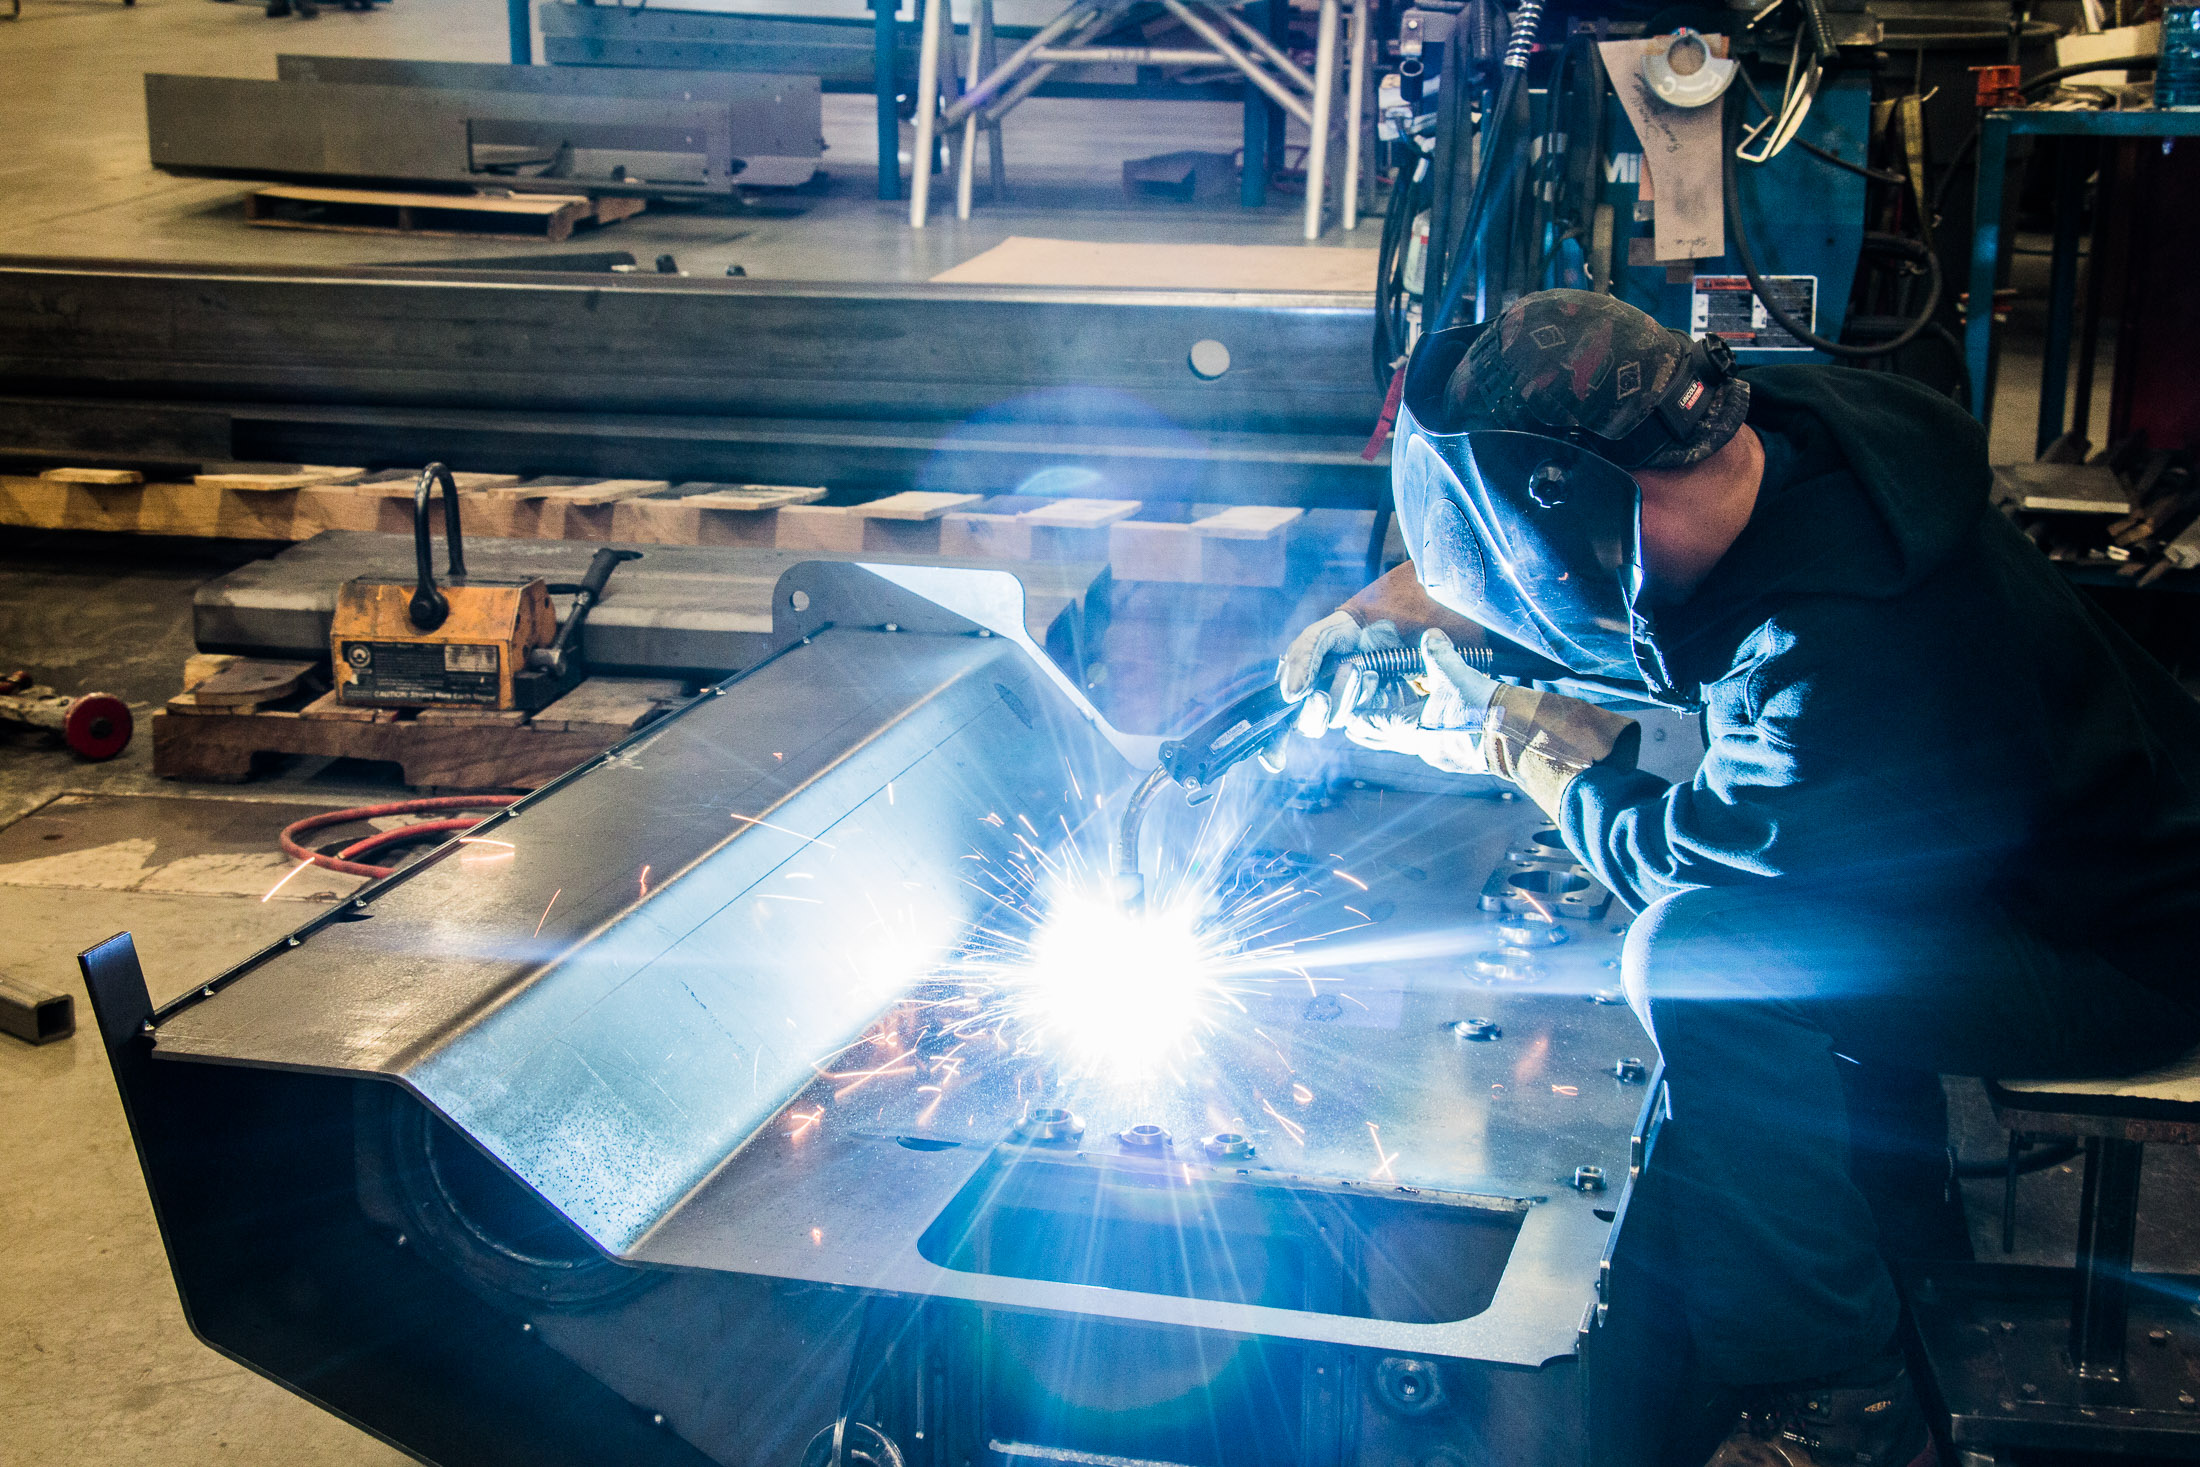 Badger Sheet Metal Works Builds Reputation for Custom Fabrication